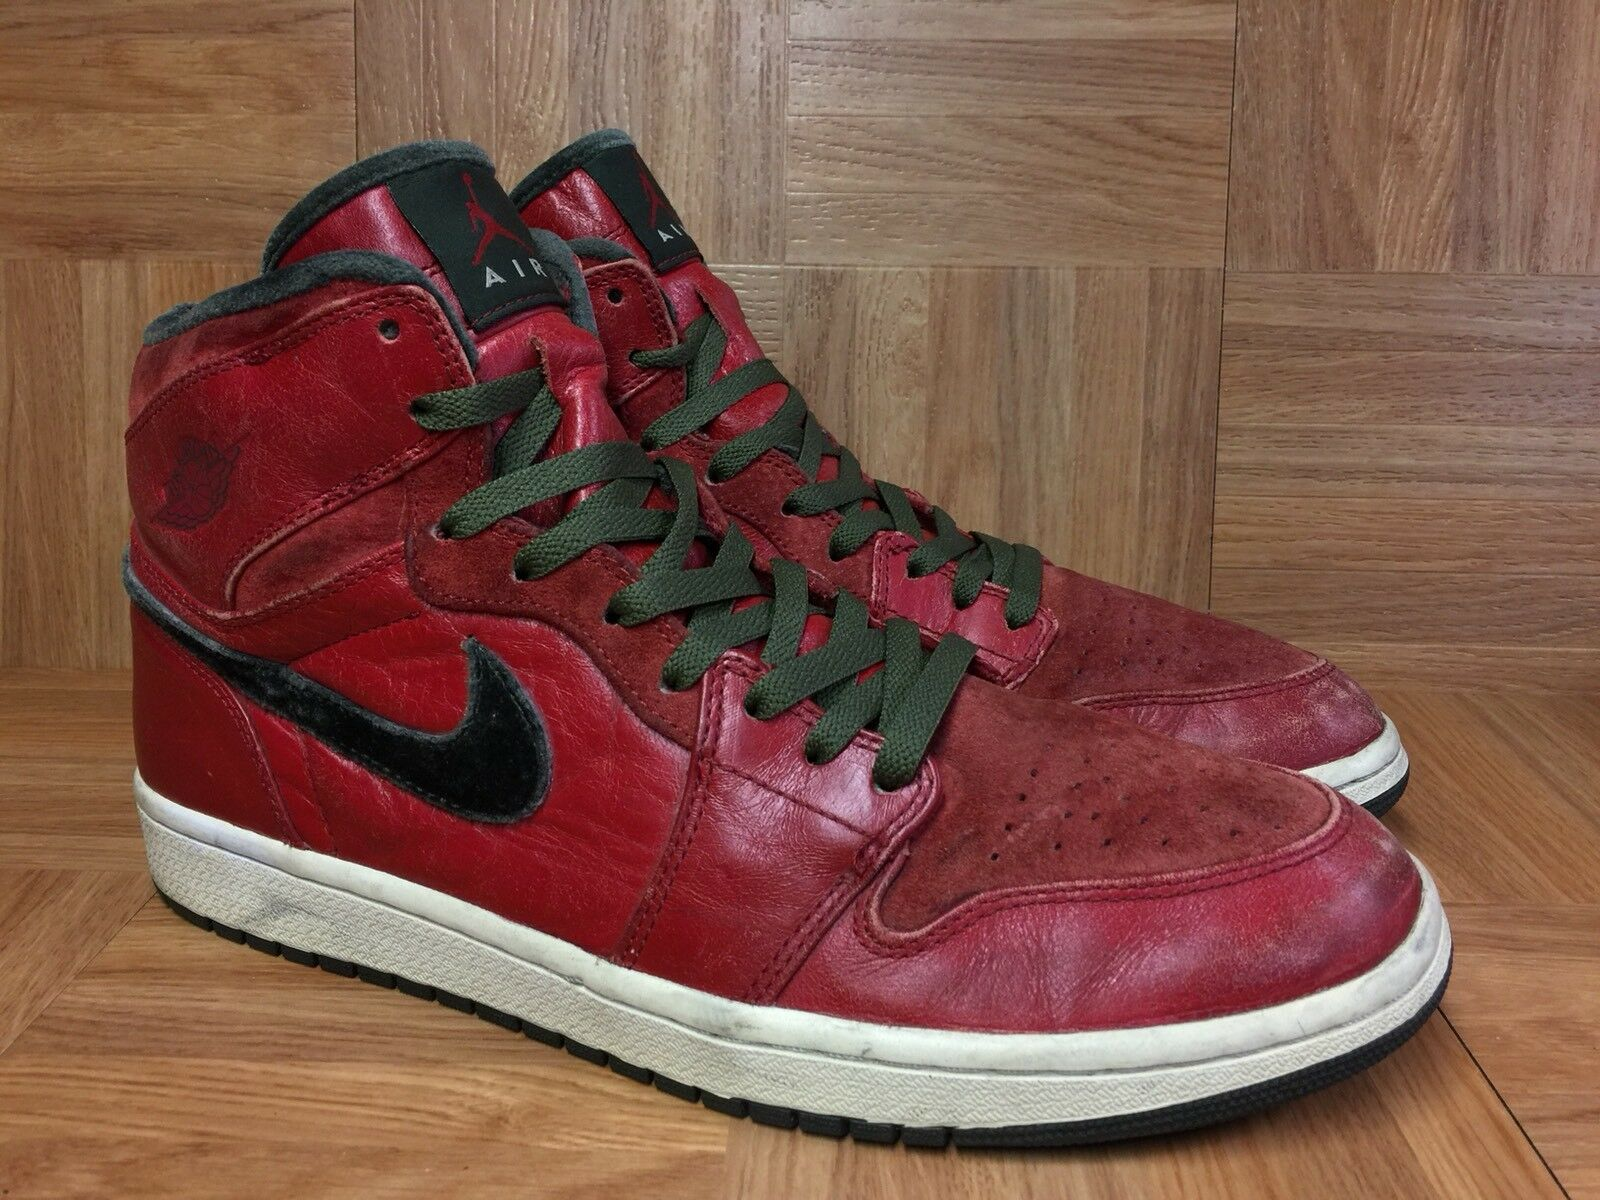 RARE Nike Air Jordan 1 Retro Hi Premier Varsity Red Army Sz 12 332134-631 Mens